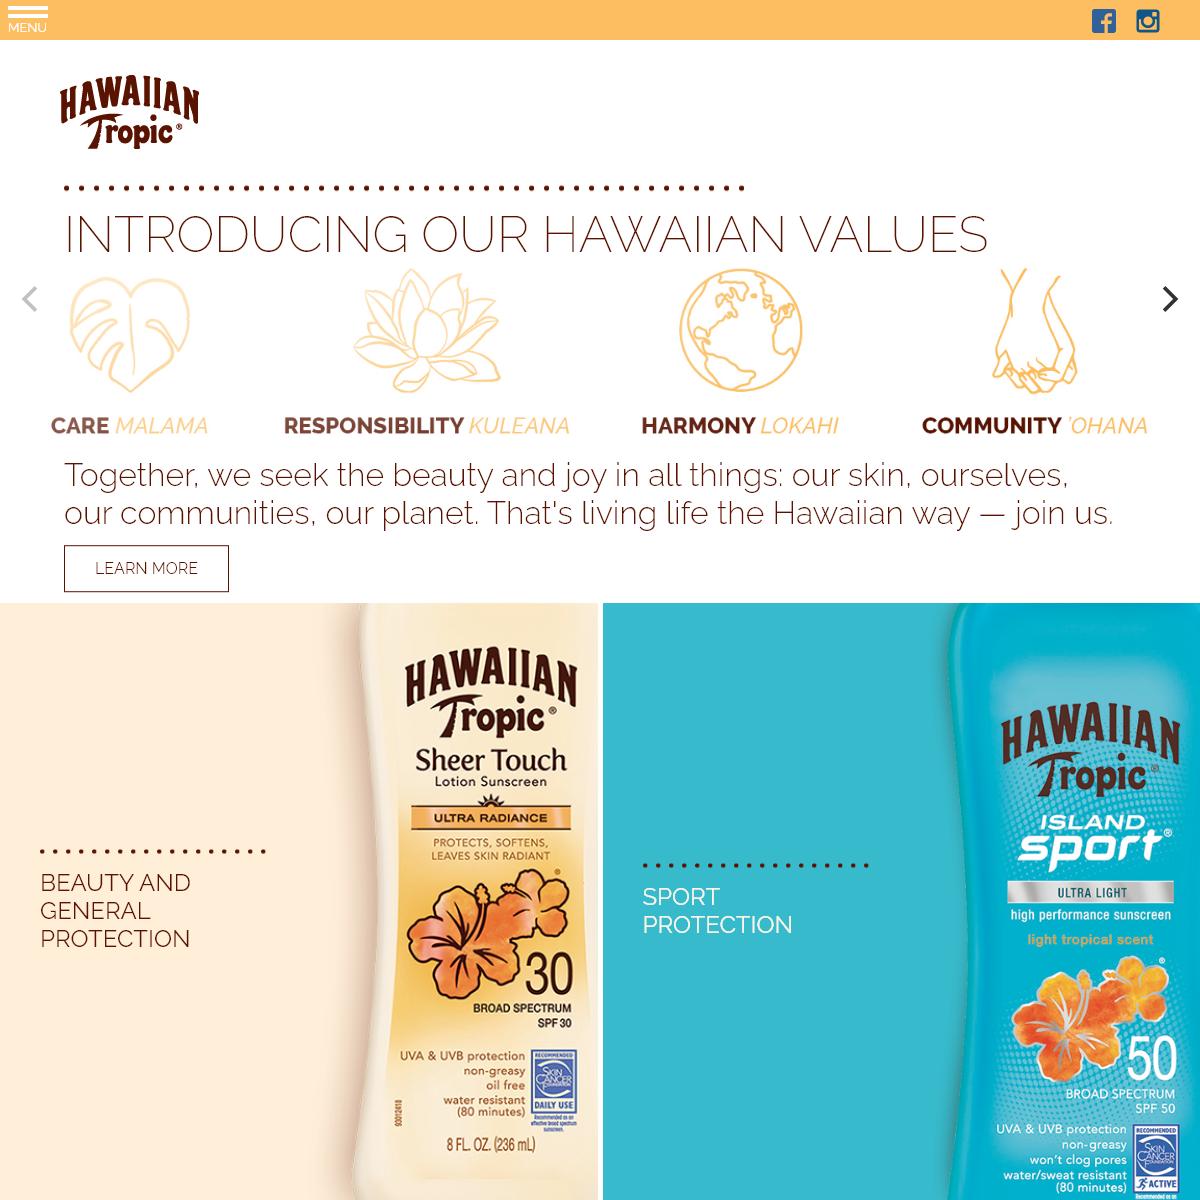 Sun Tan Lotions and Sunscreen - Hawaiian Tropic